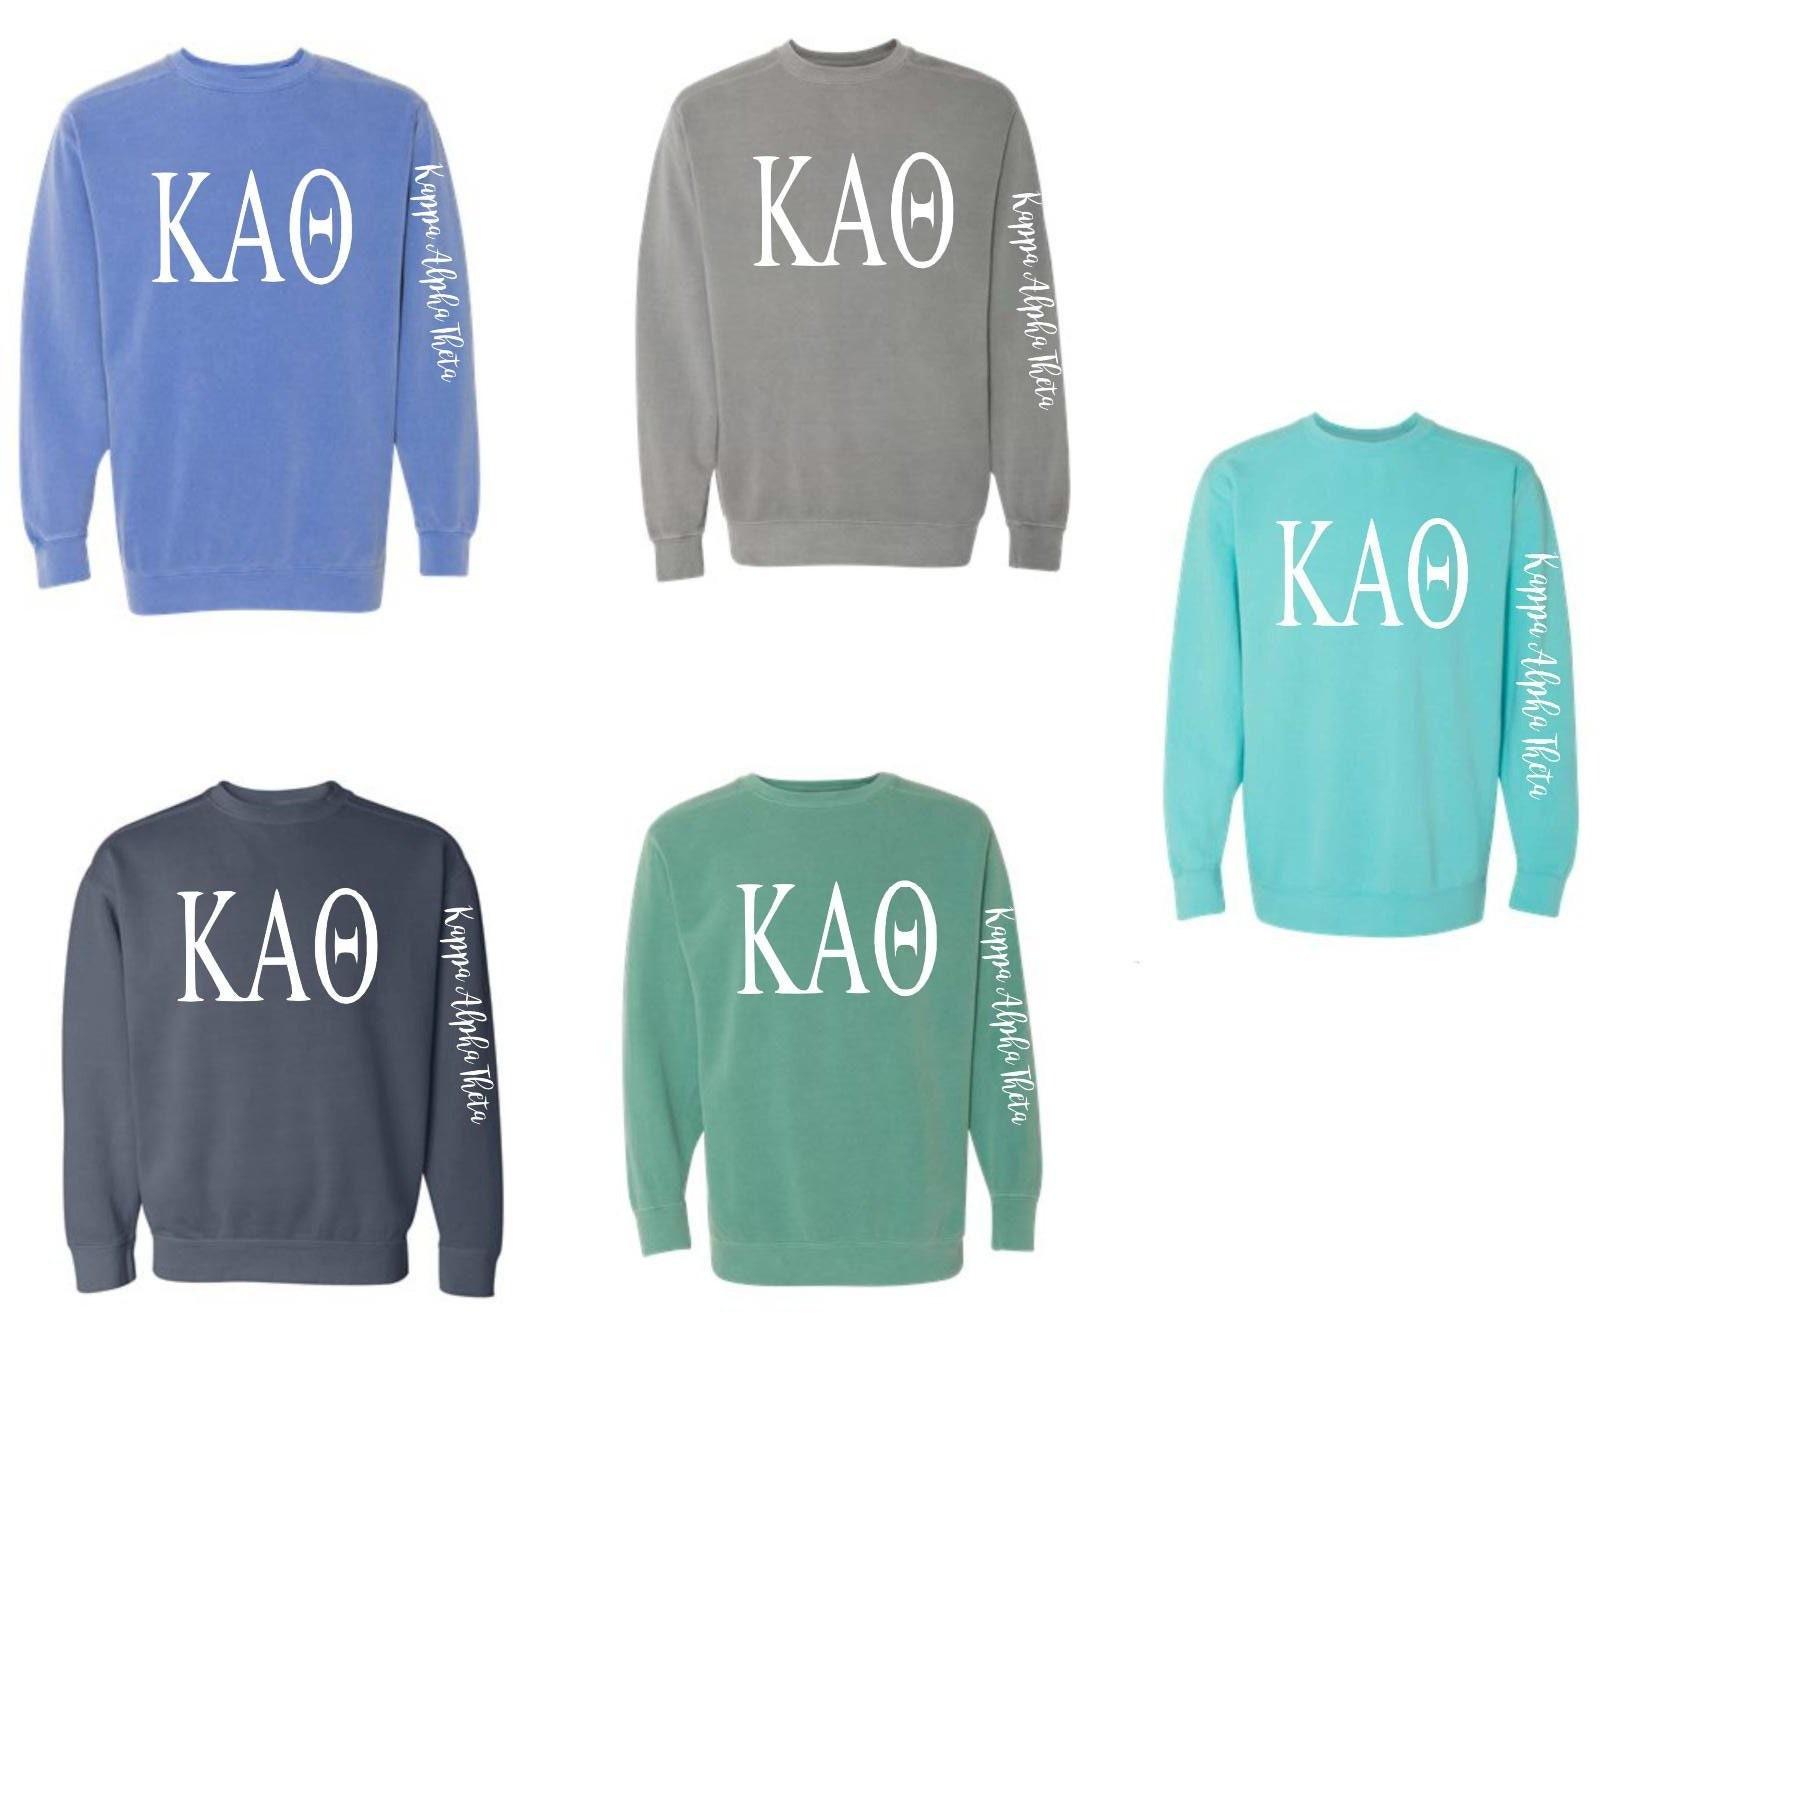 05036fc2 Kappa Alpha Theta Comfort Colors Crewneck Sweatshirt | Etsy